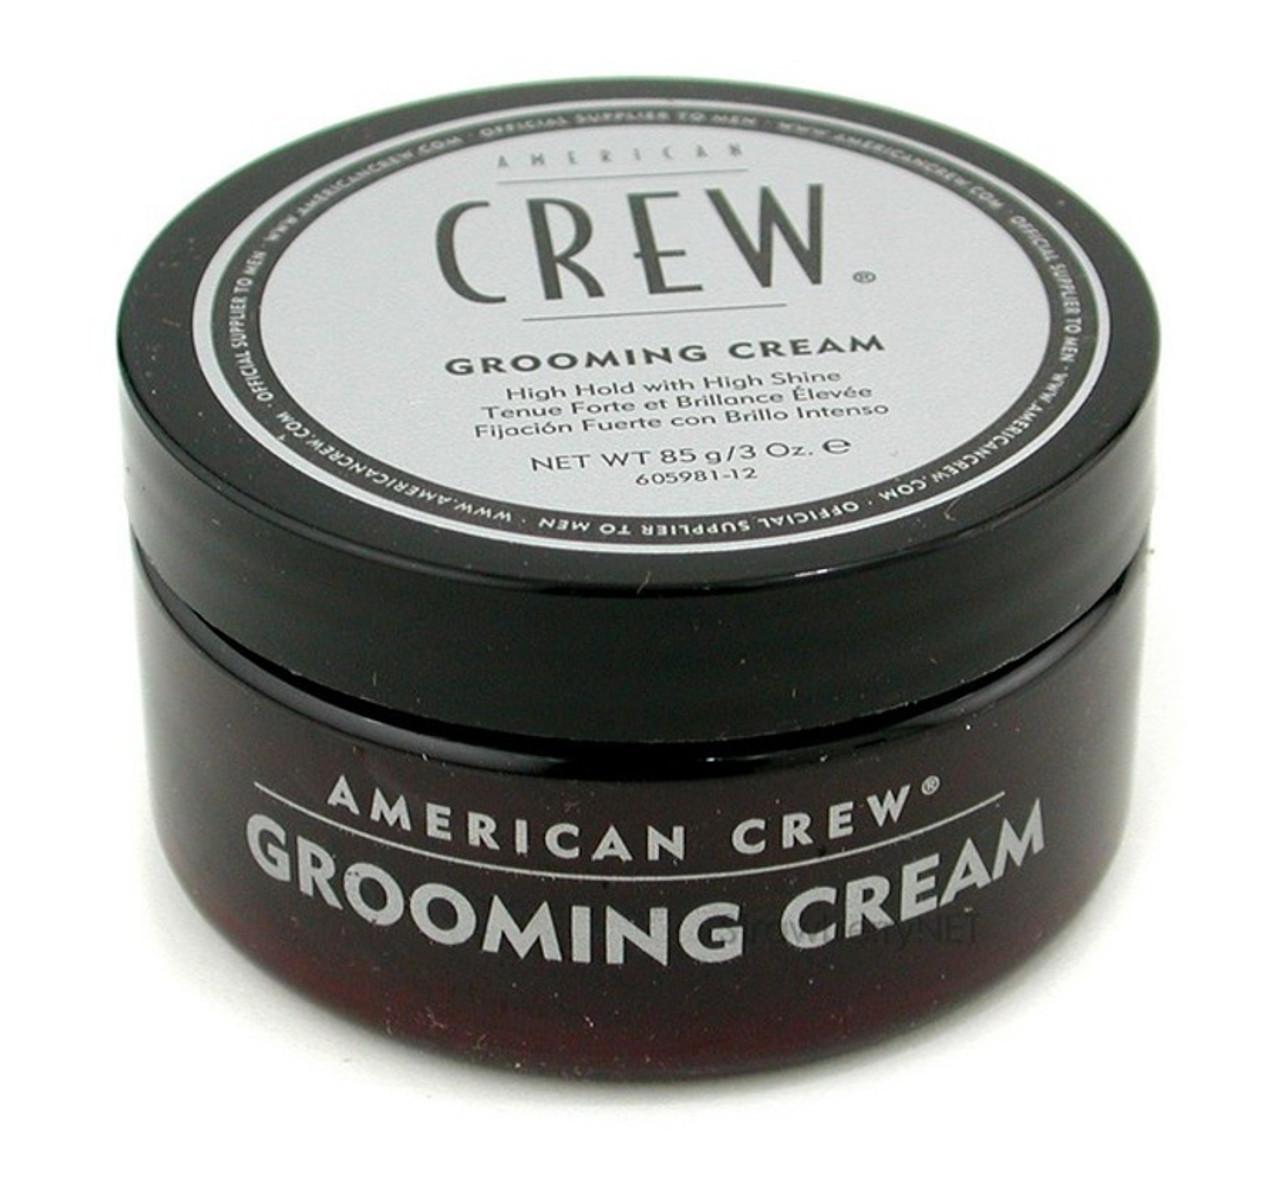 American Crew Grooming Cream 3 oz